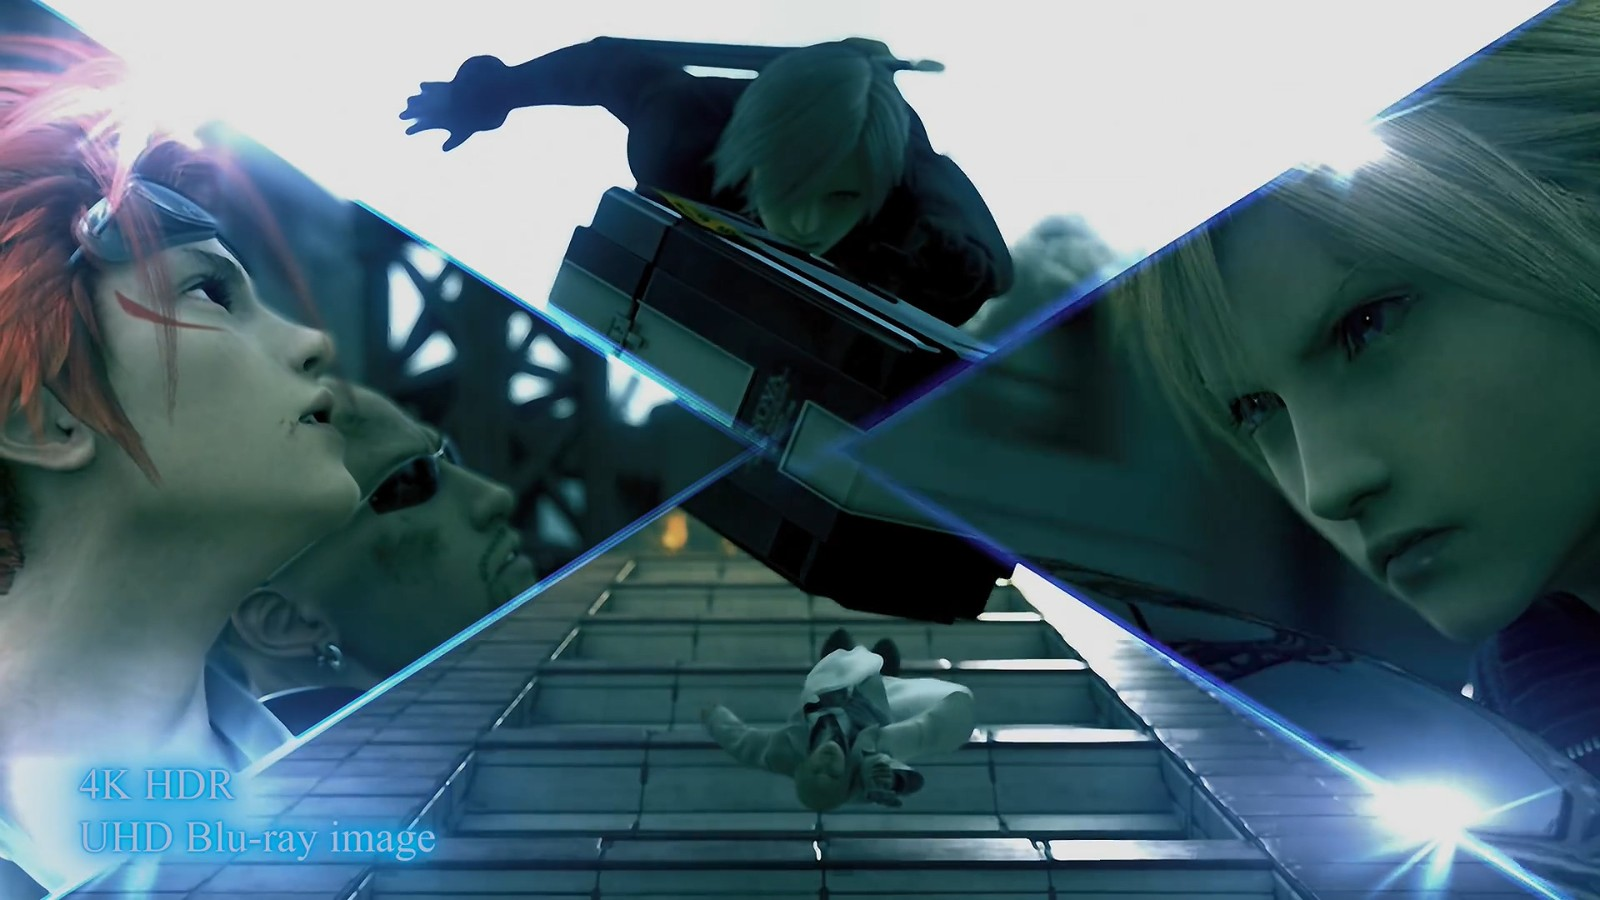 SE发布《最终幻想7:圣子降临》4K版对比视频